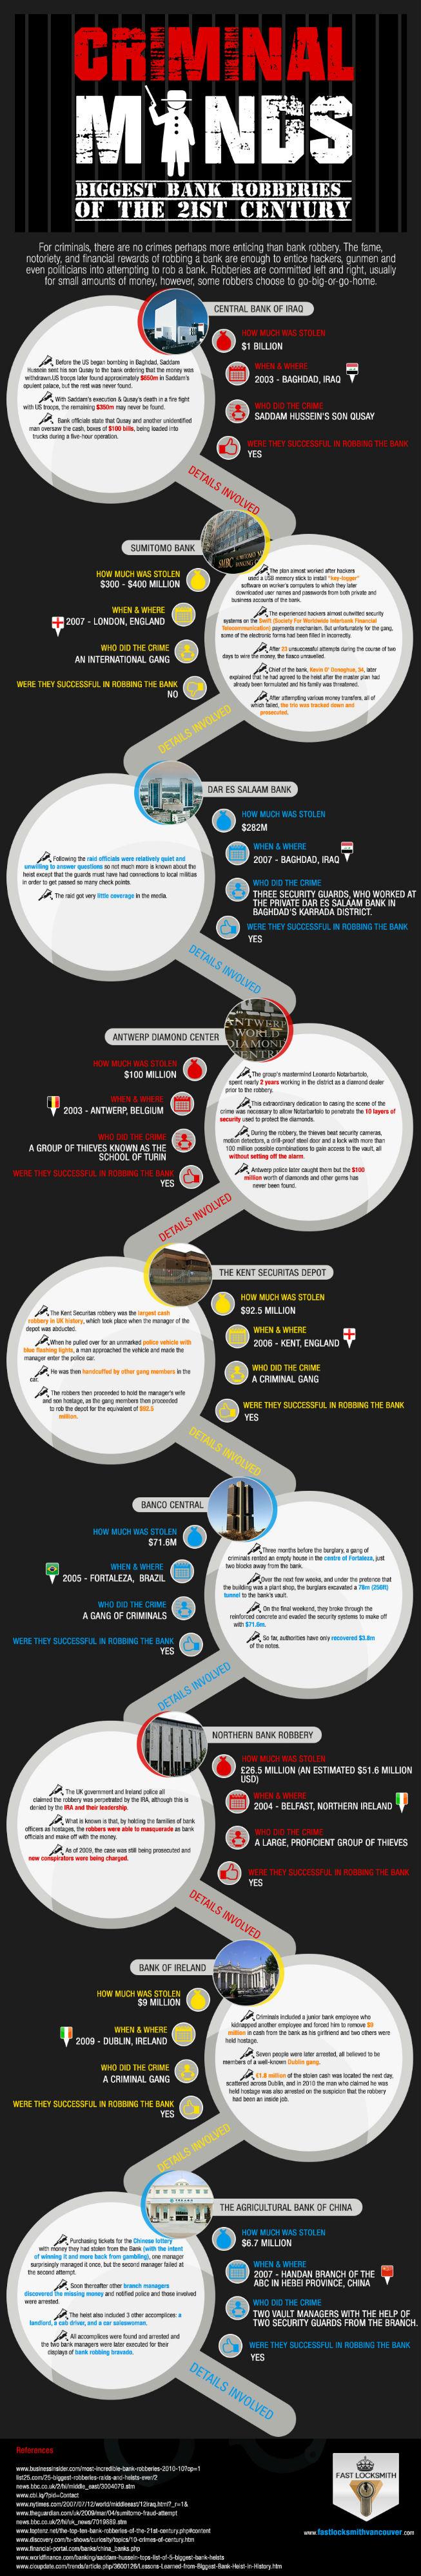 Criminal Minds [Infographic]